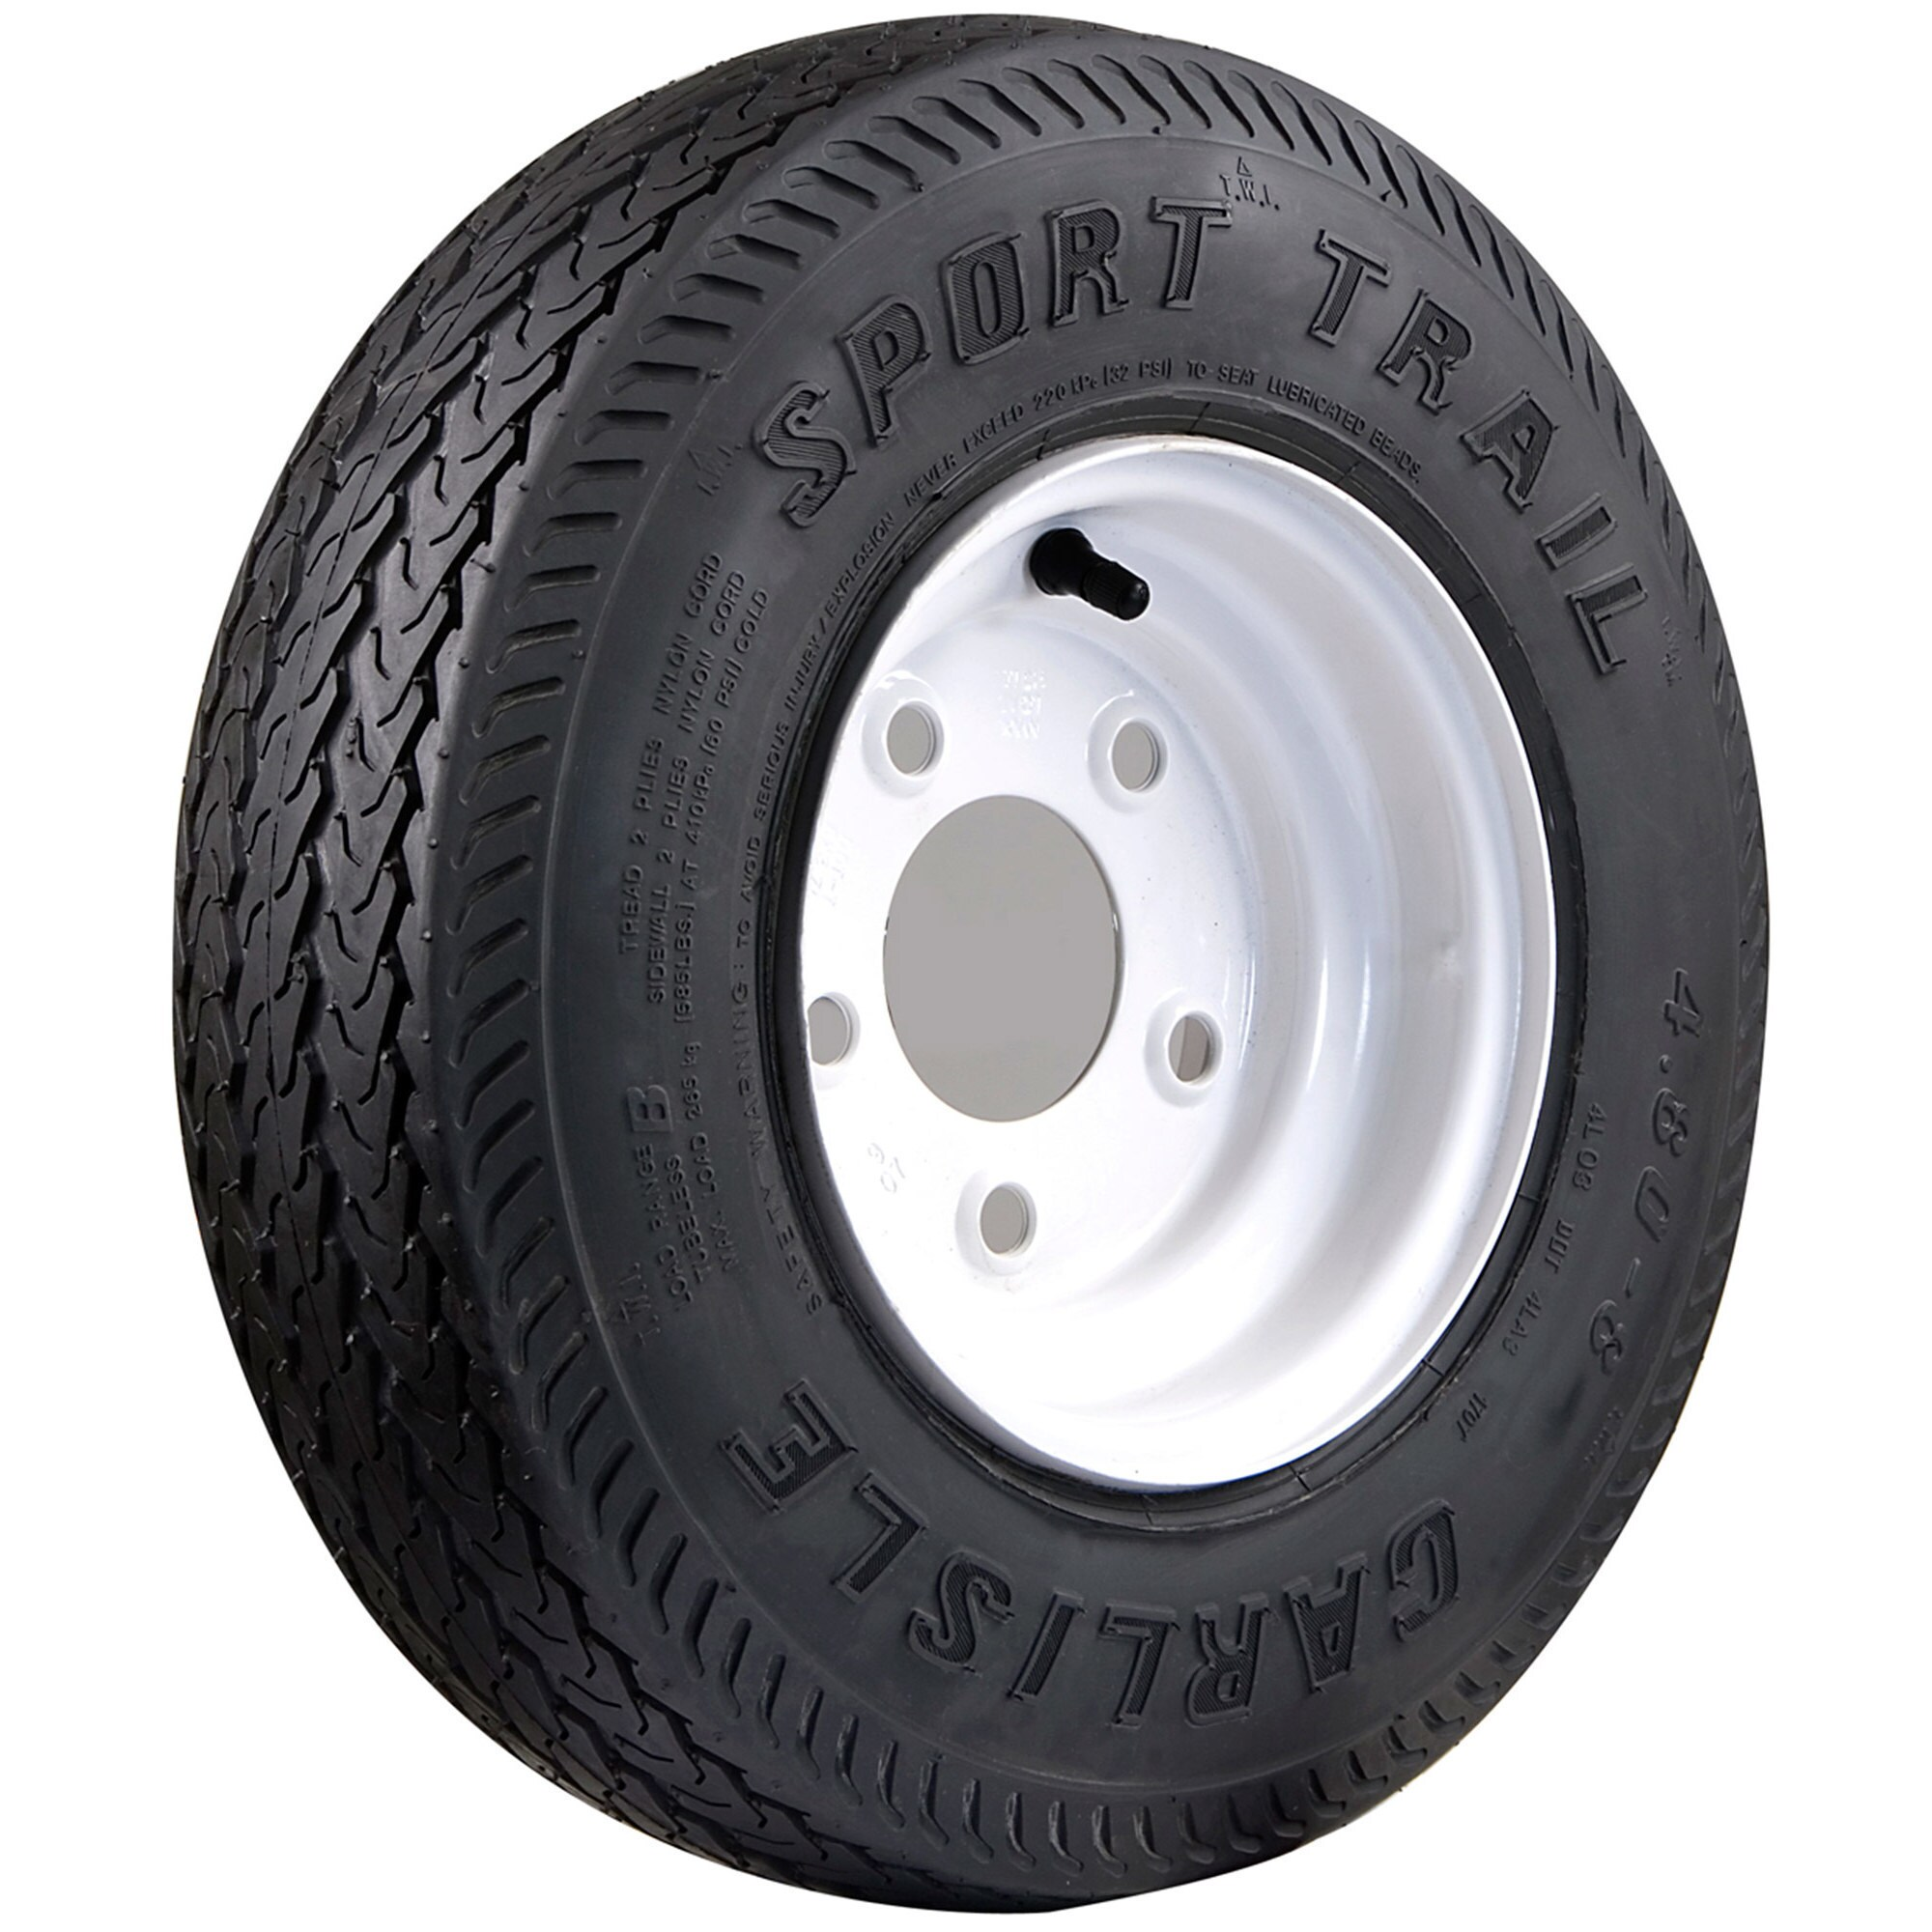 Carlisle Sport Trail Bias Trailer Tire - 480-8 LRB/4 ply ...